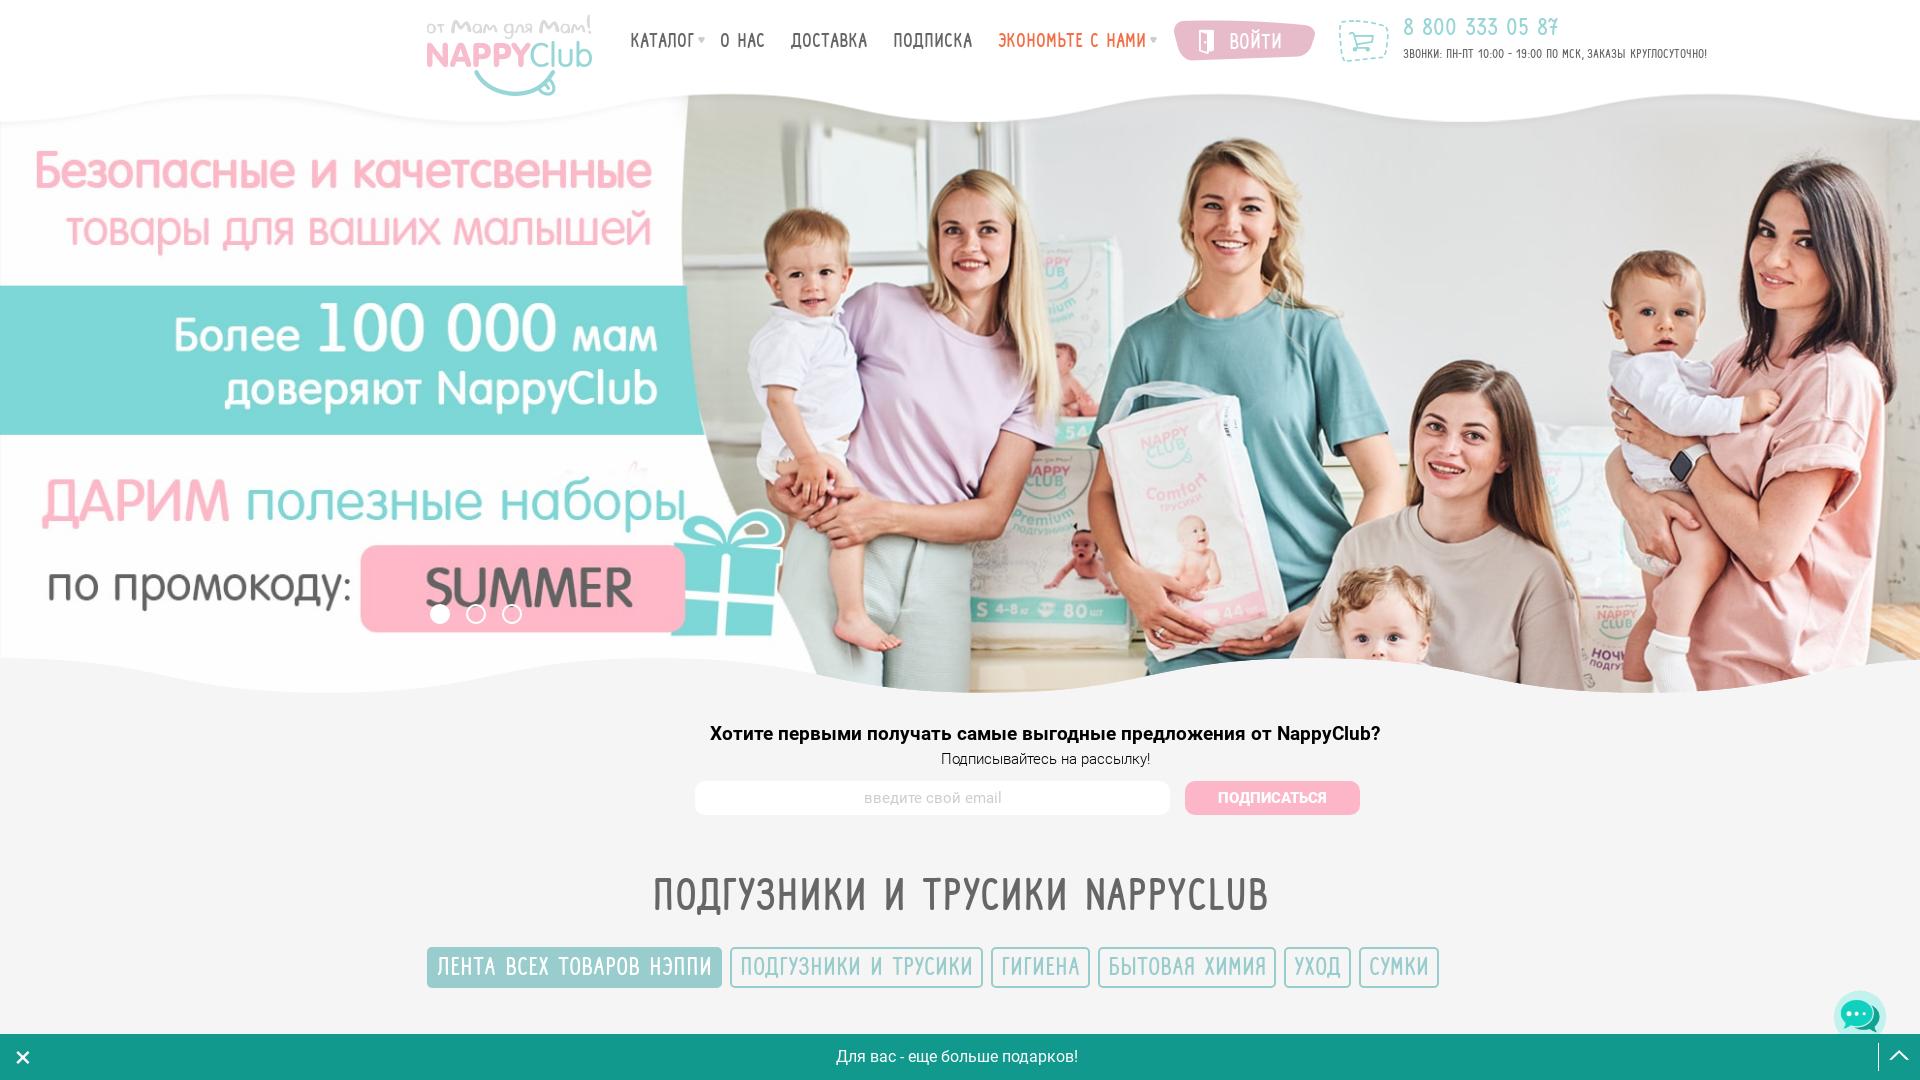 Nappyclub website